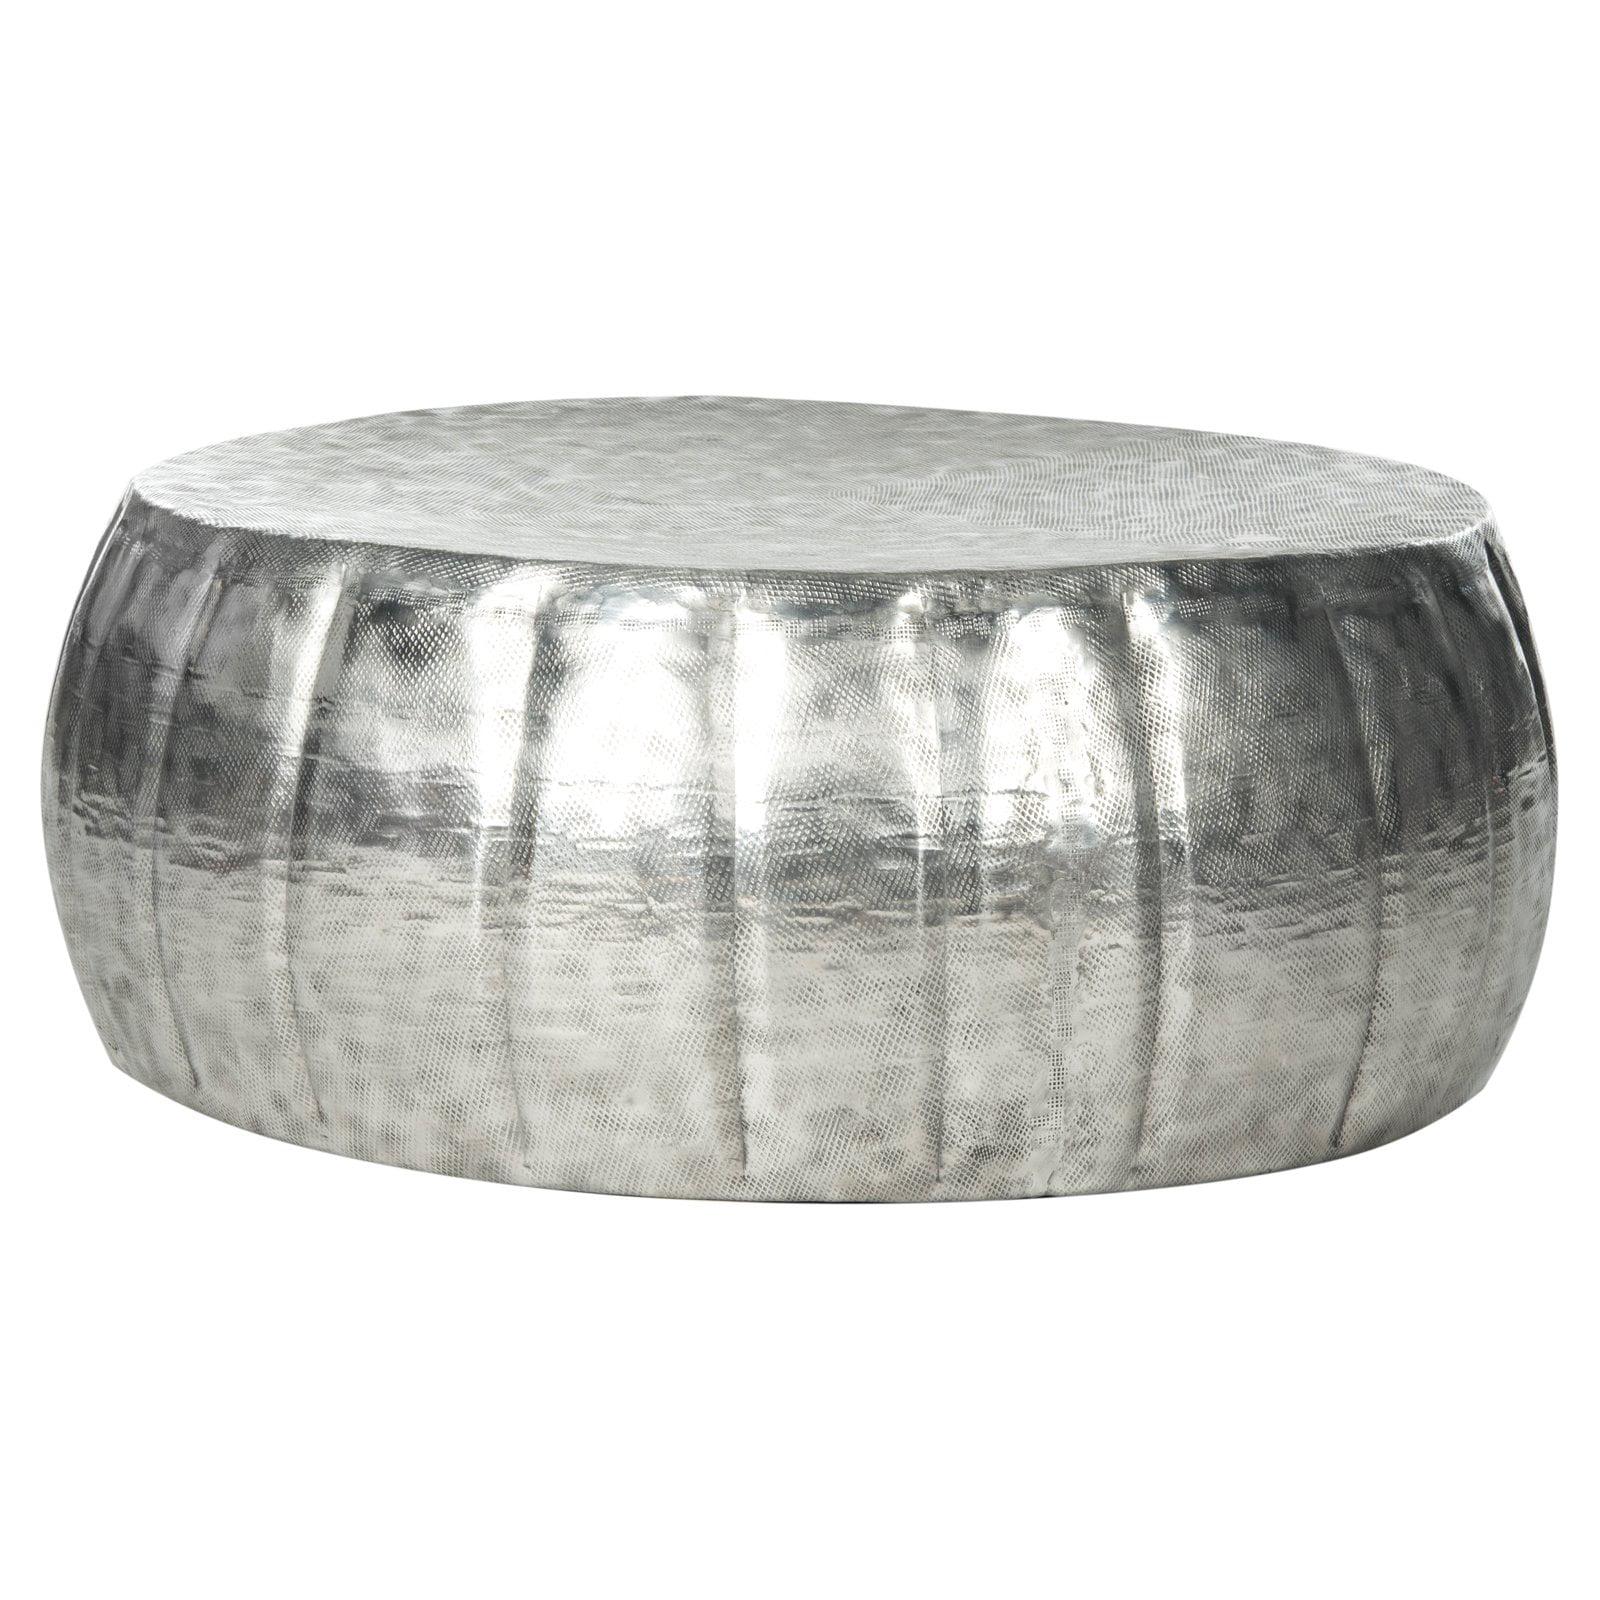 Safavieh Dara Coffee Table, Silver